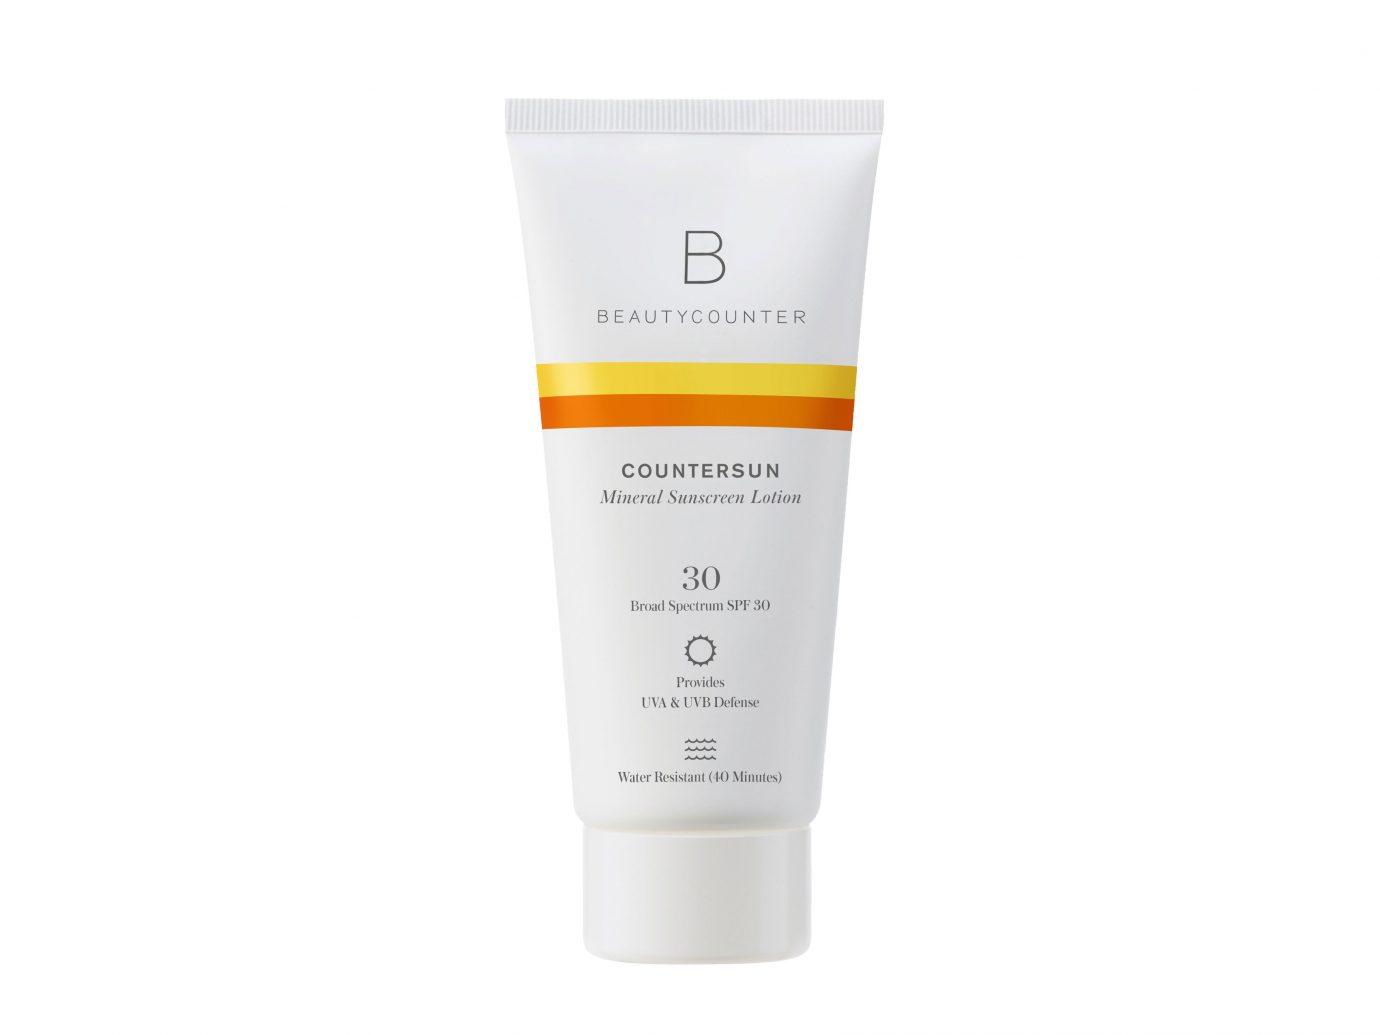 Countersun Mineral Sunscreen Lotion SPF 30